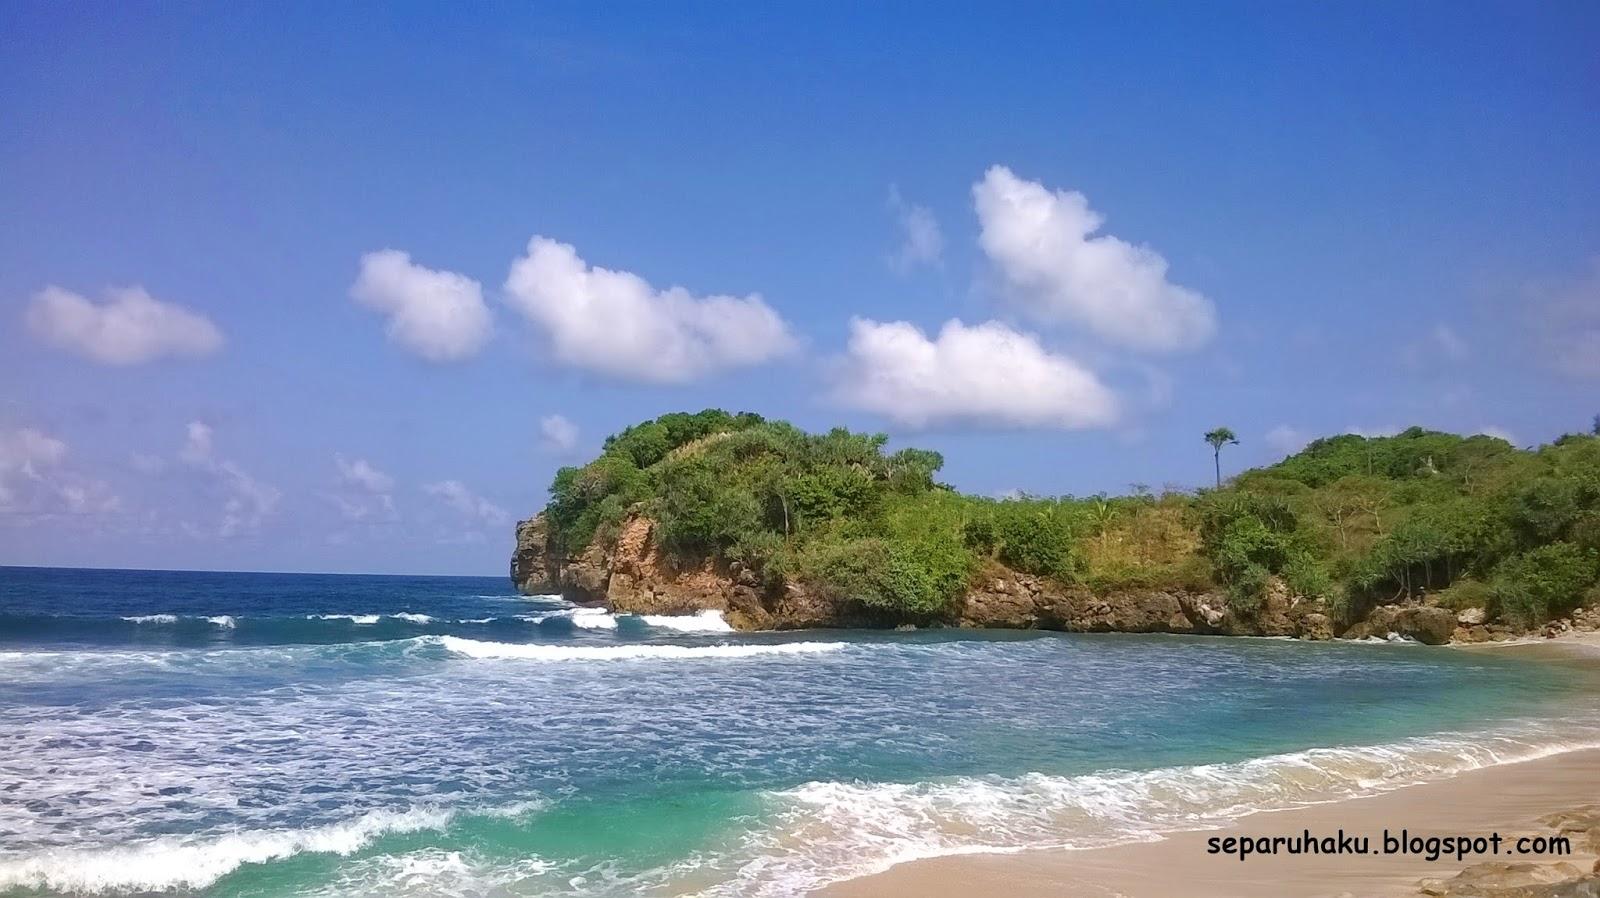 Tempat Rekreasi Blitar Yang Oke Mulai Pantai Hingga Pegunungan